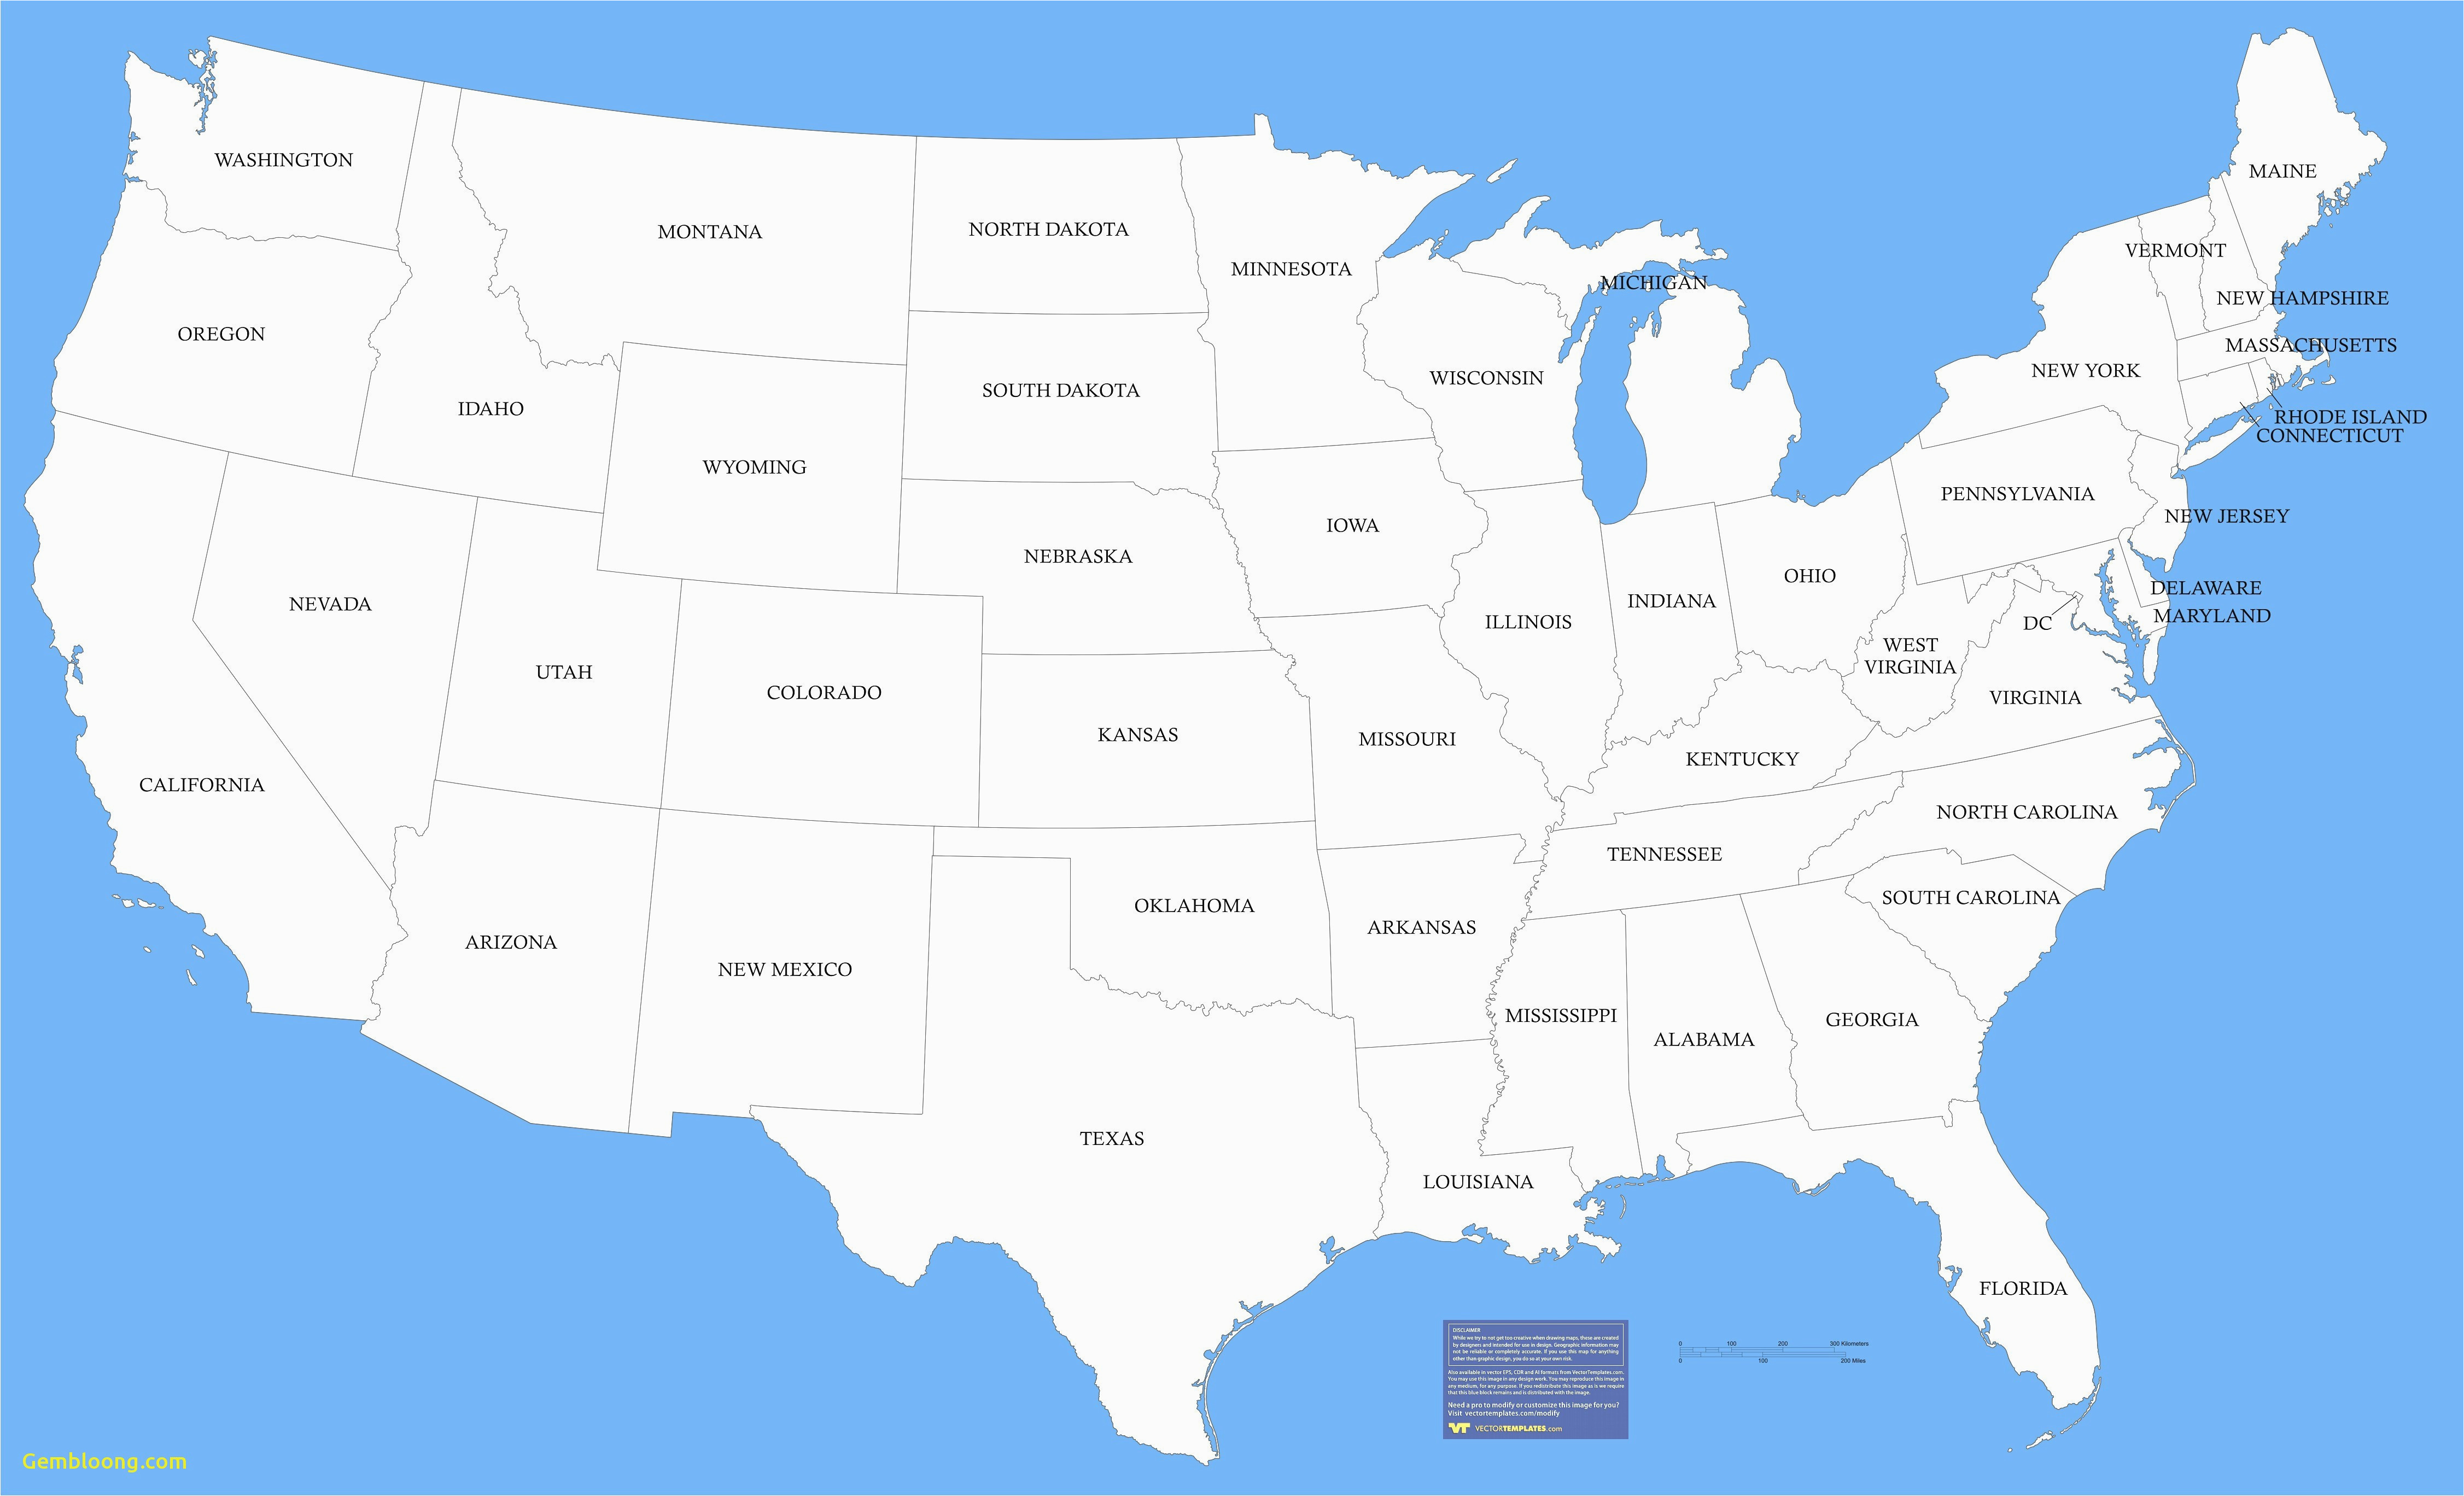 oregon zip code map inspirational southern california zip code map